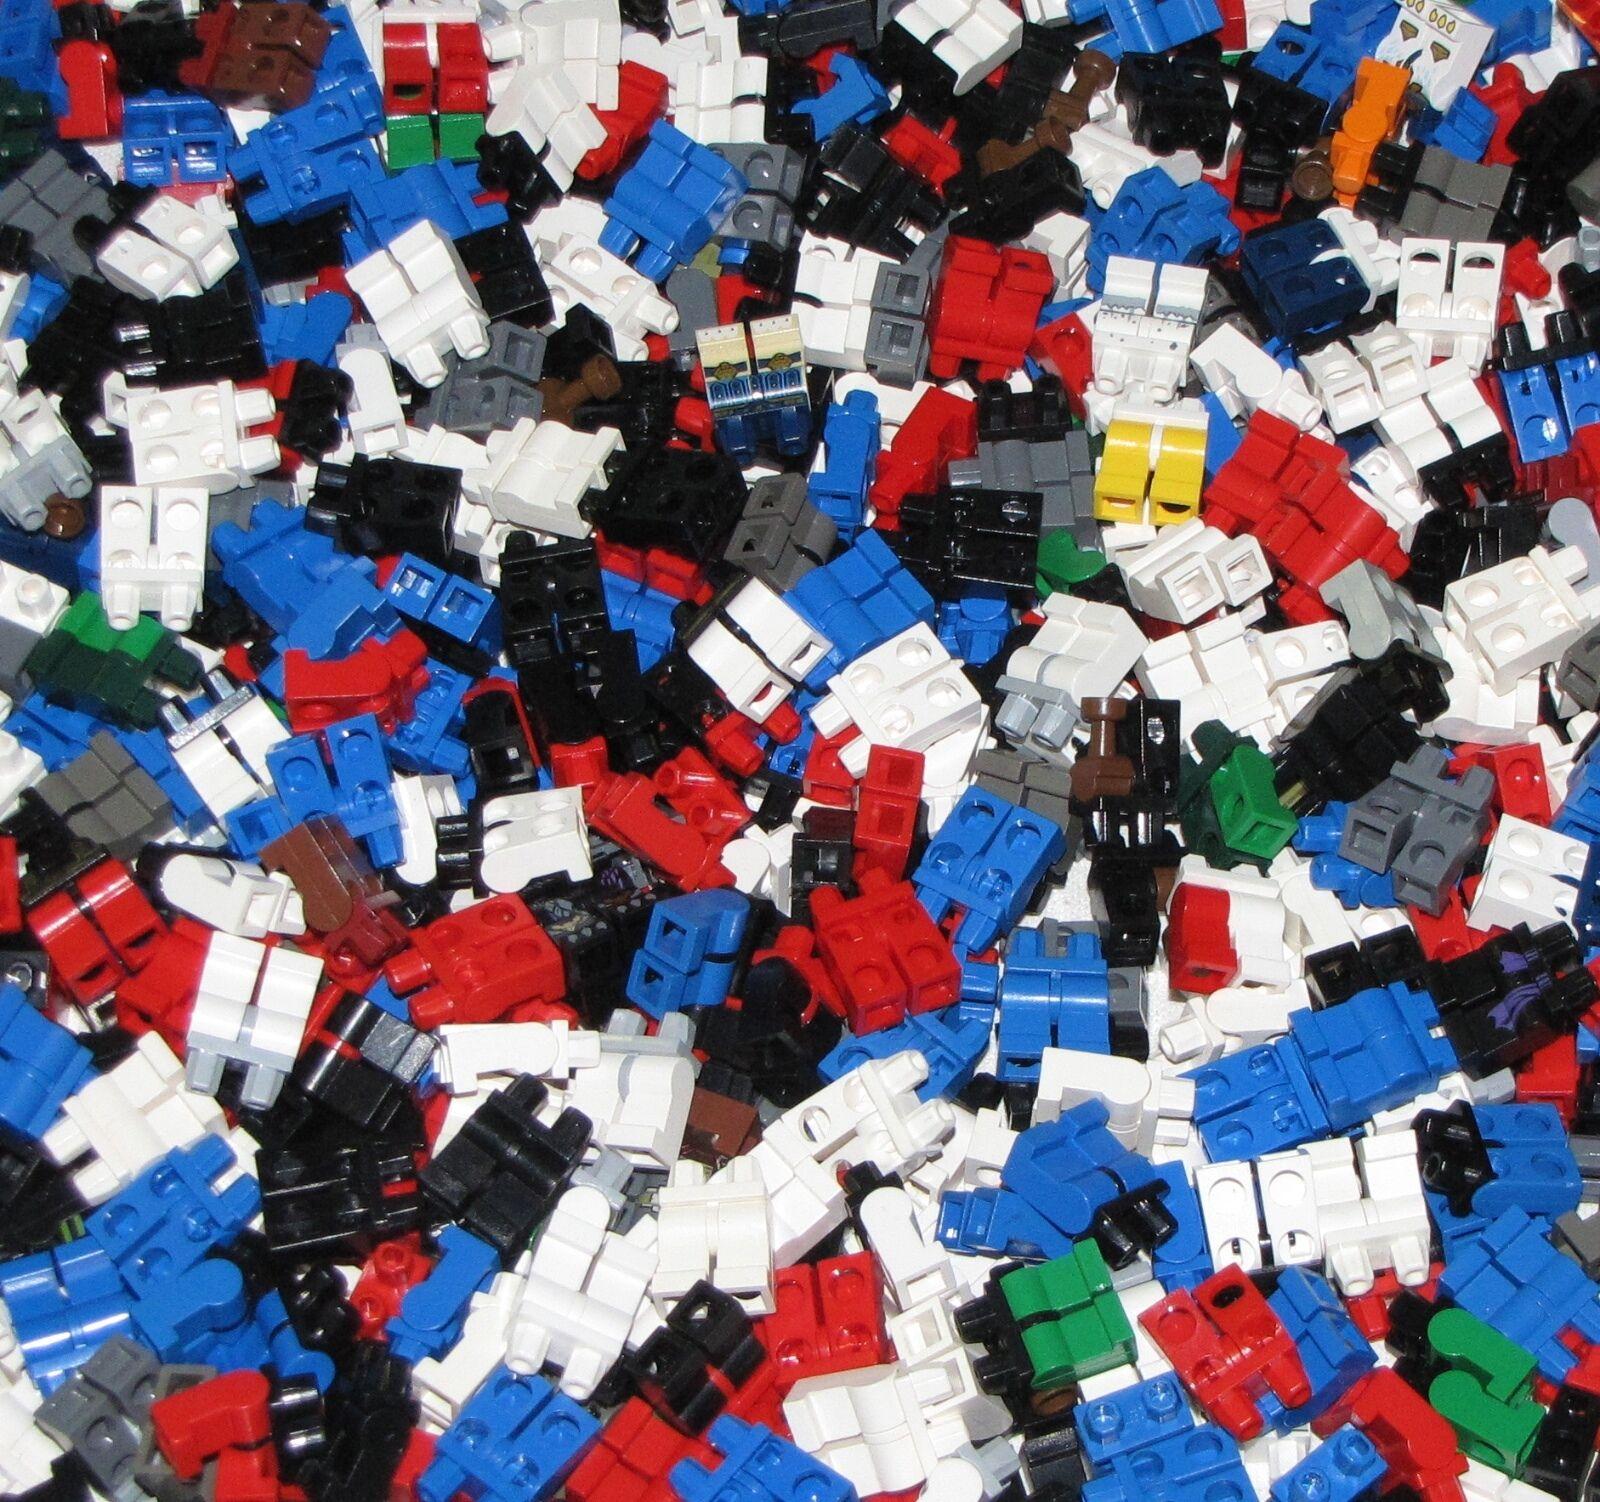 LEGO BULK LOT OF 100 100 100 MINIFIGURE MINIFIG LEGS PANTS CITY TOWN FIGURE BODY PARTS e6cd5e